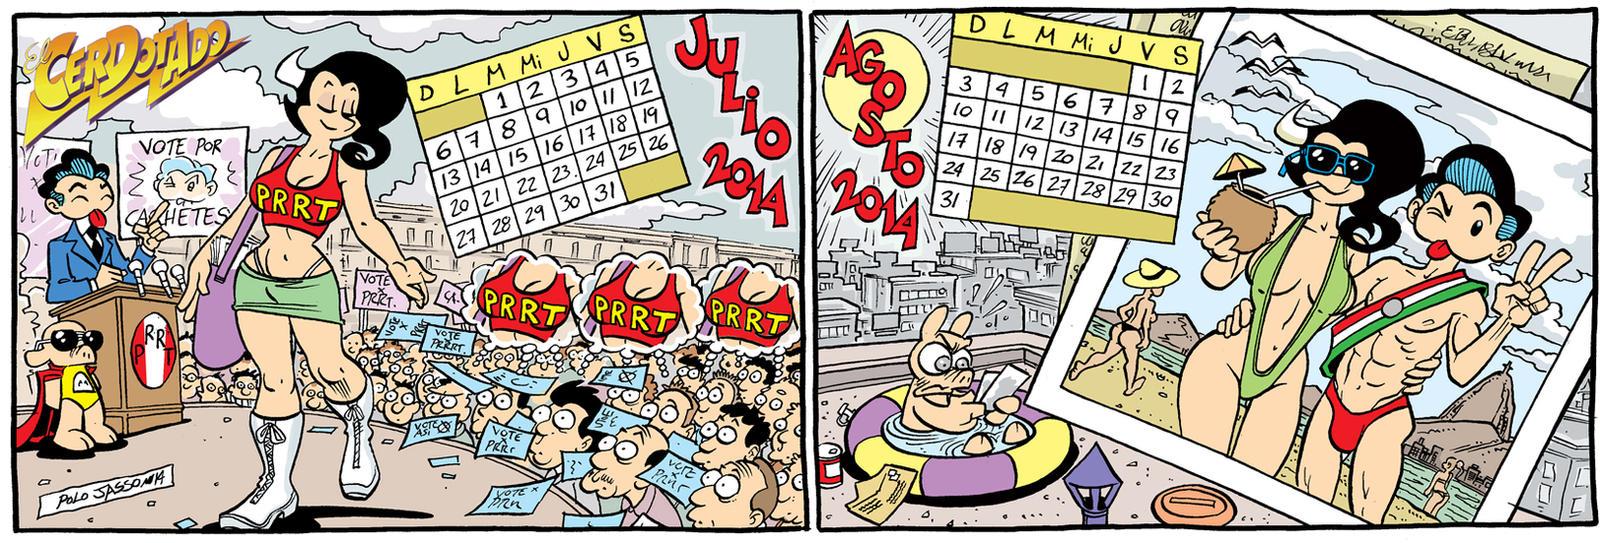 Calendario 2014 Julio-Agosto by POLO-JASSO